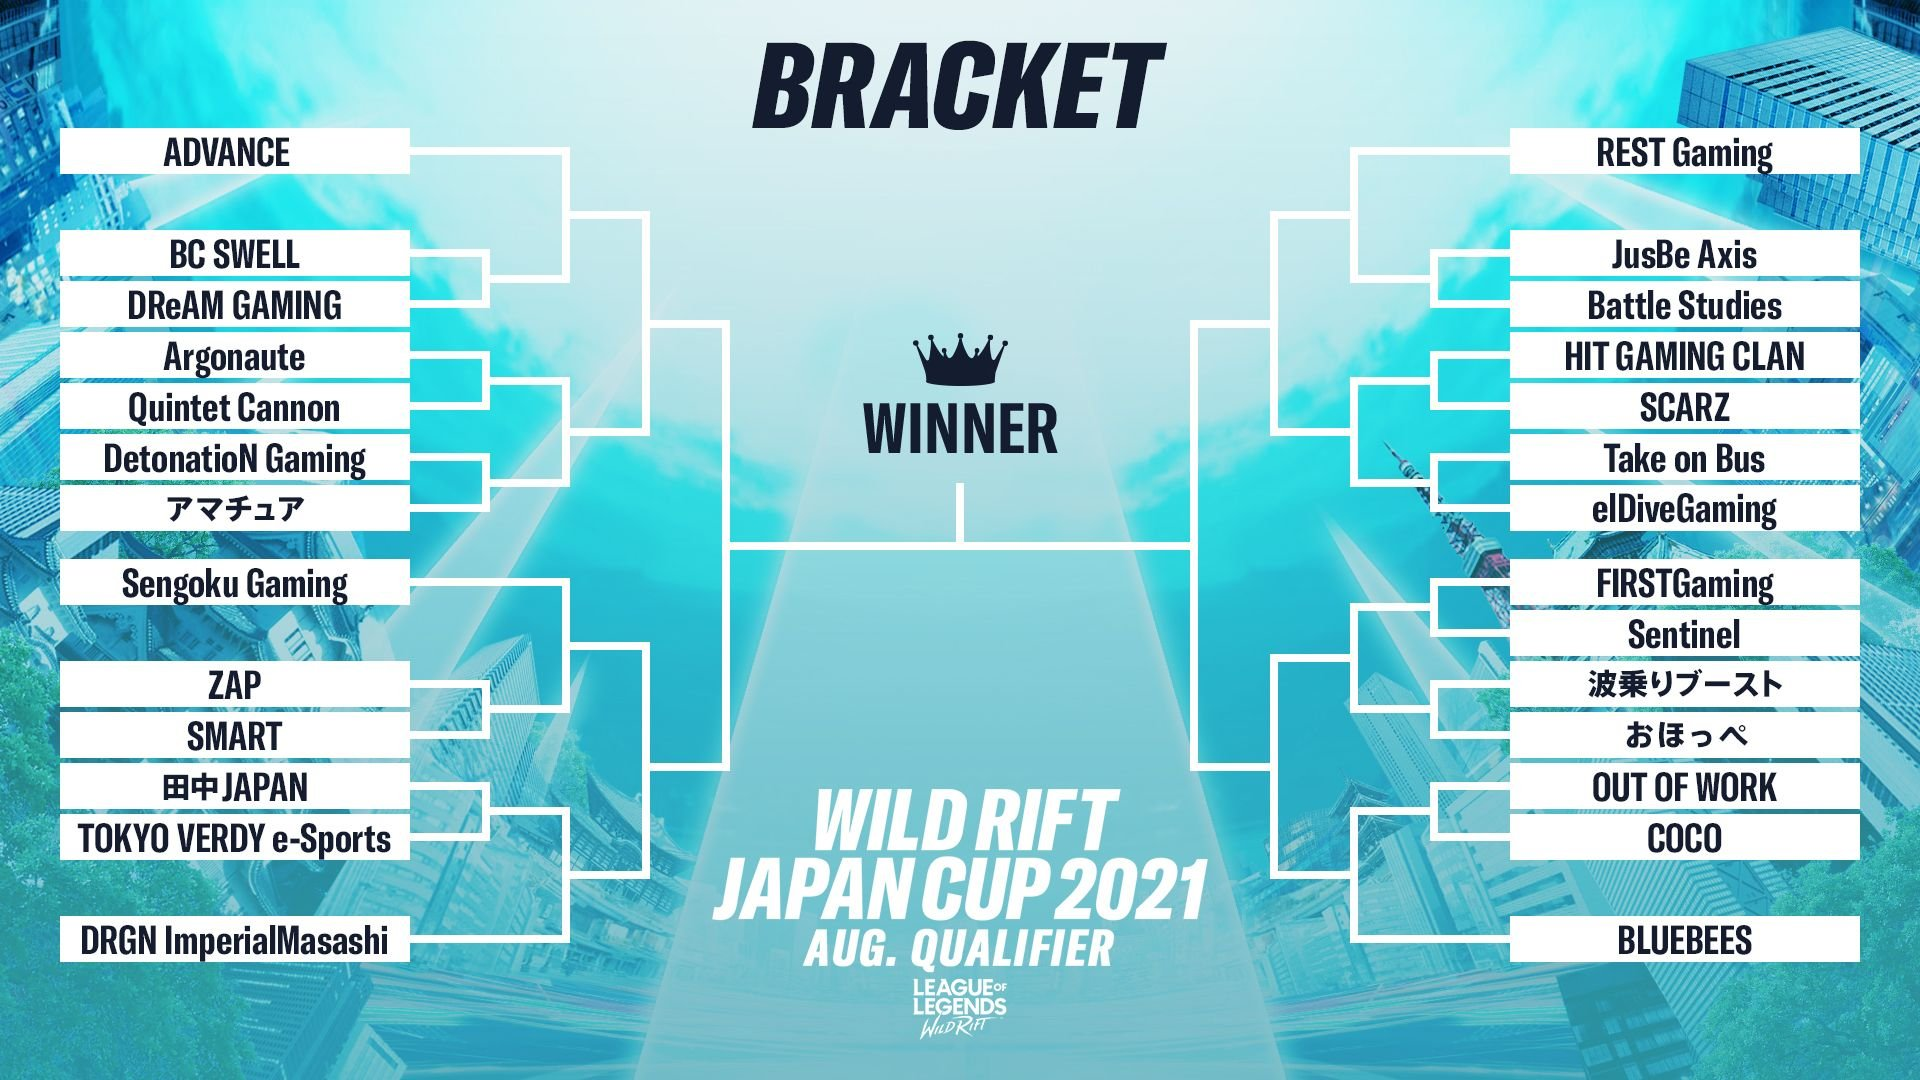 【 ワイルドリフト部門 】『ワイルドリフト JAPAN CUP 2021 7月予選大会』出場